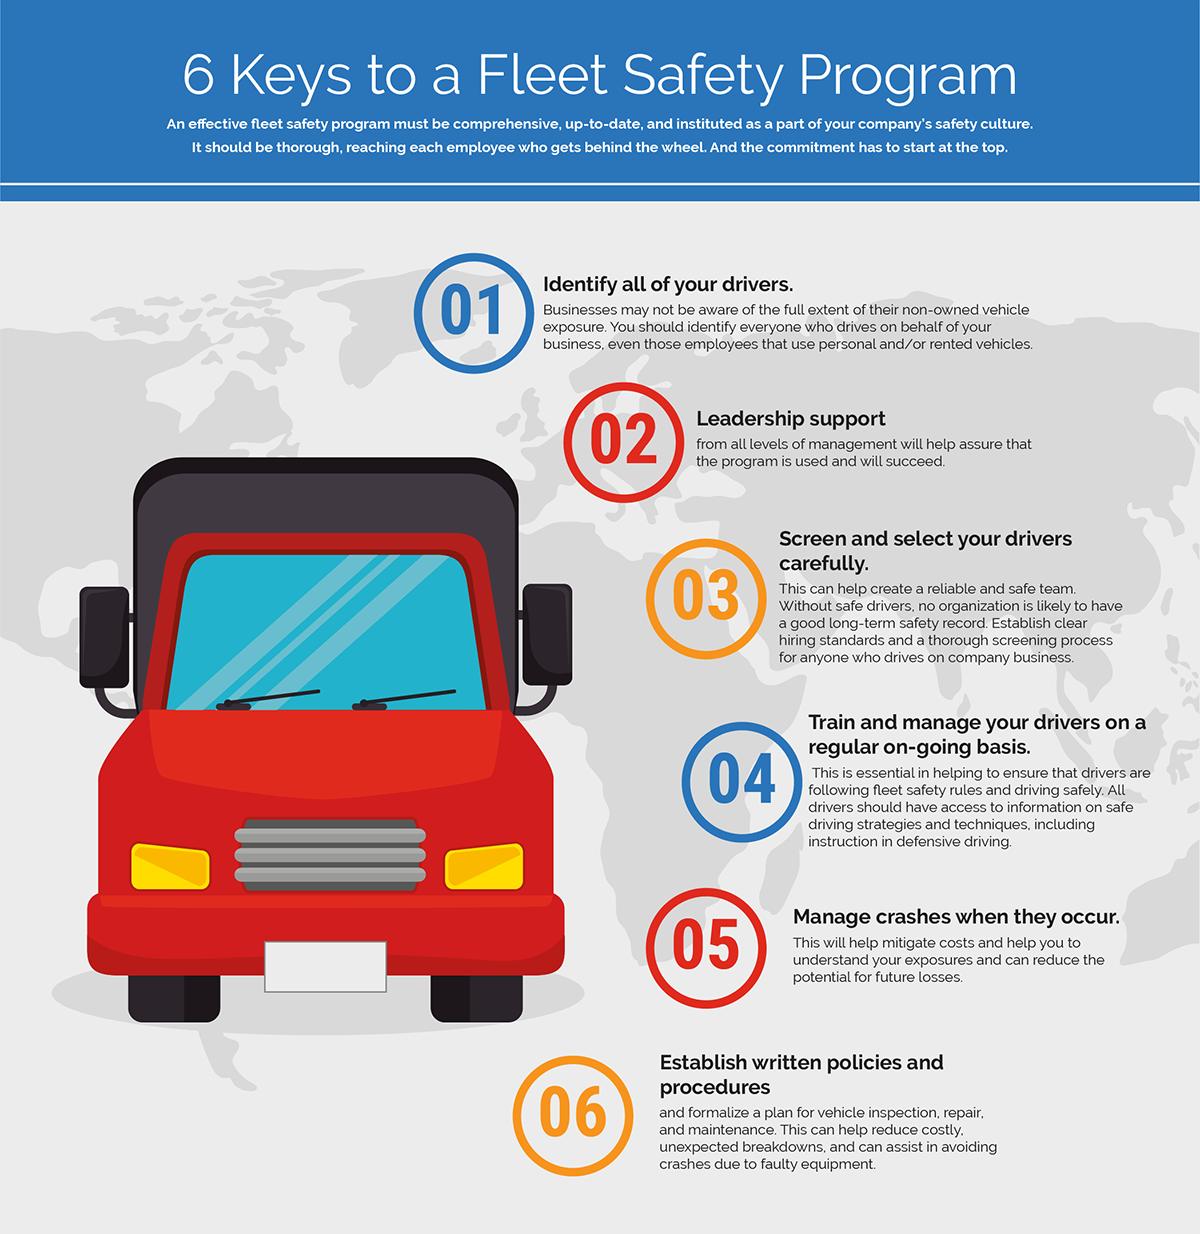 6-Keys-to-a-Fleet-Safety-Program-small-5c05ade03346e.png